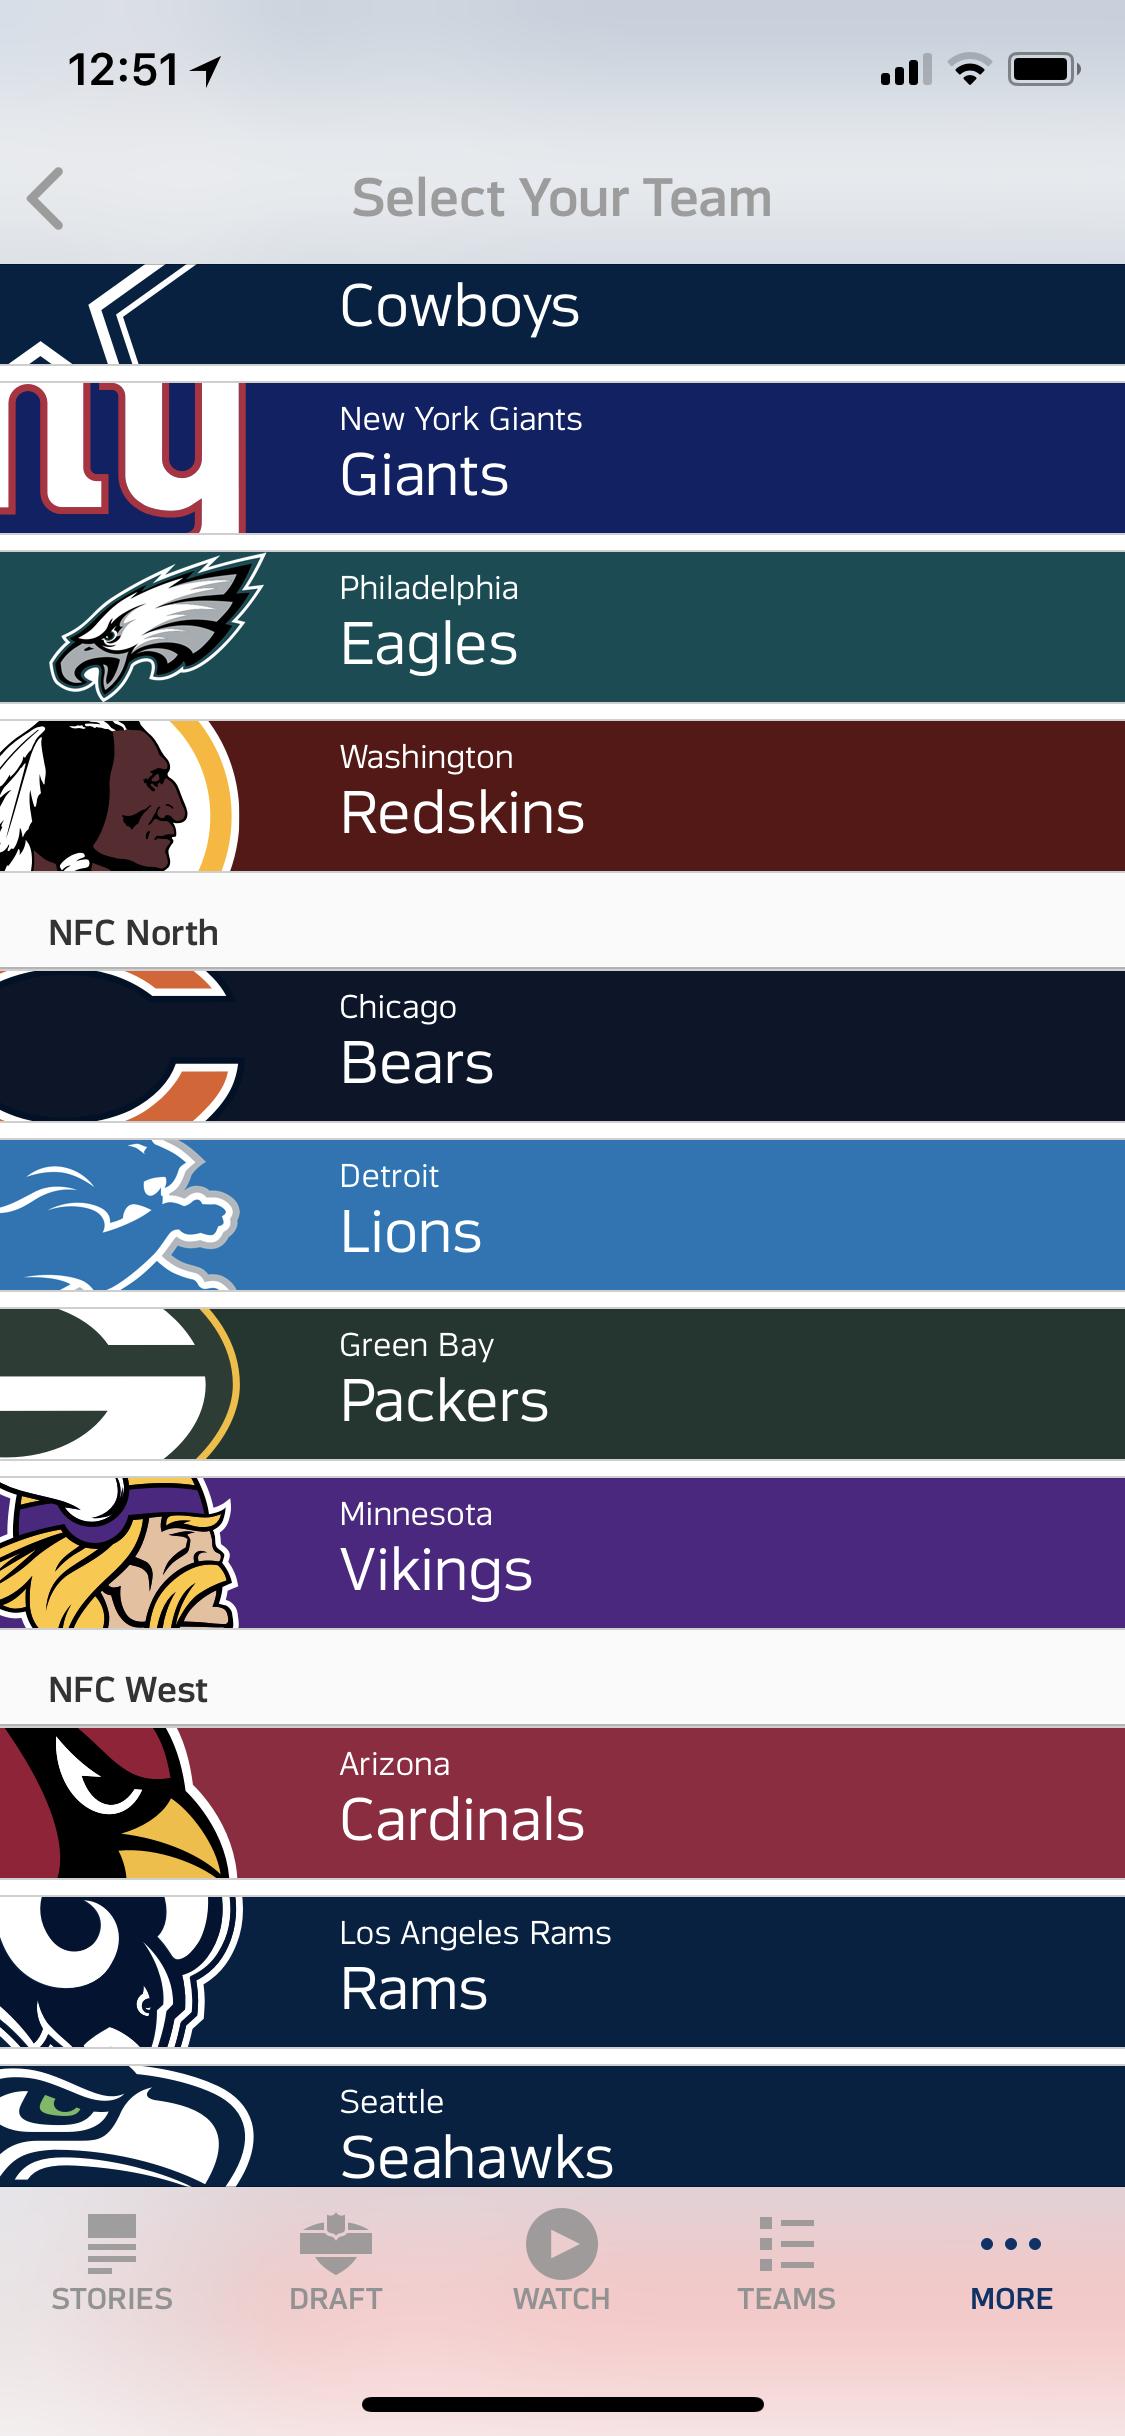 Select the Philadelphia Eagles